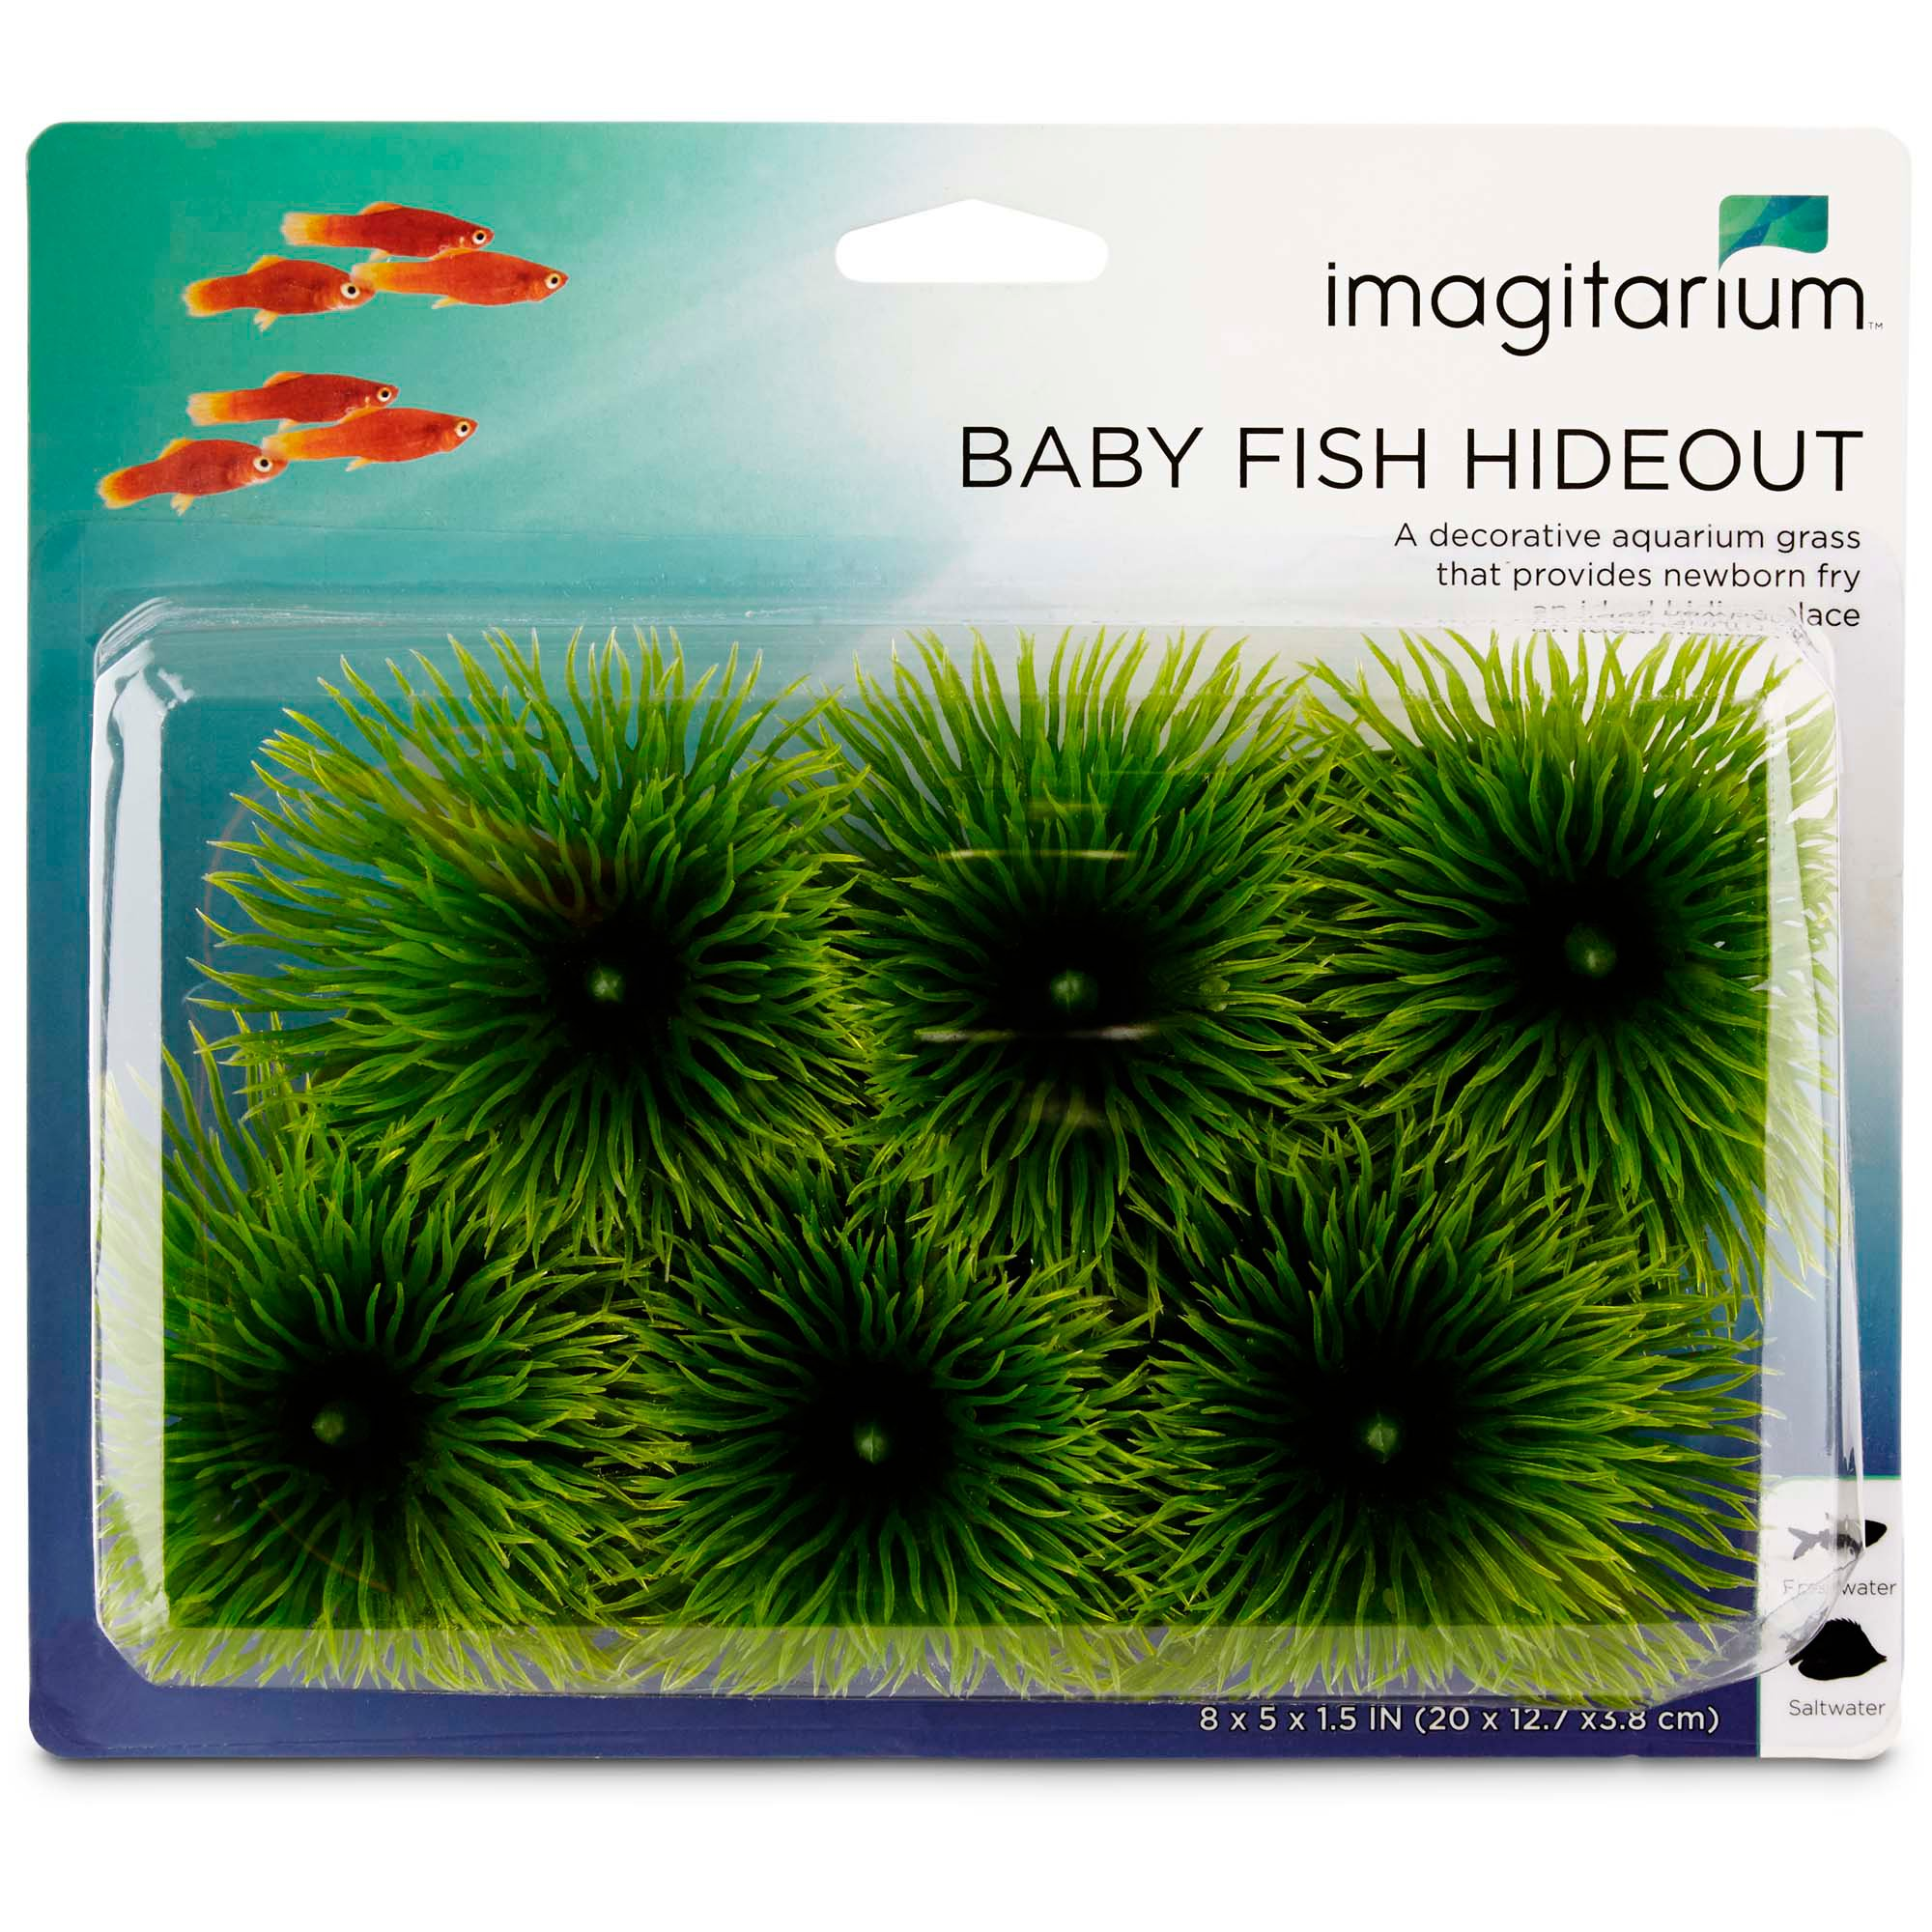 Imagitarium baby fish hideout petco for Petco tropical fish